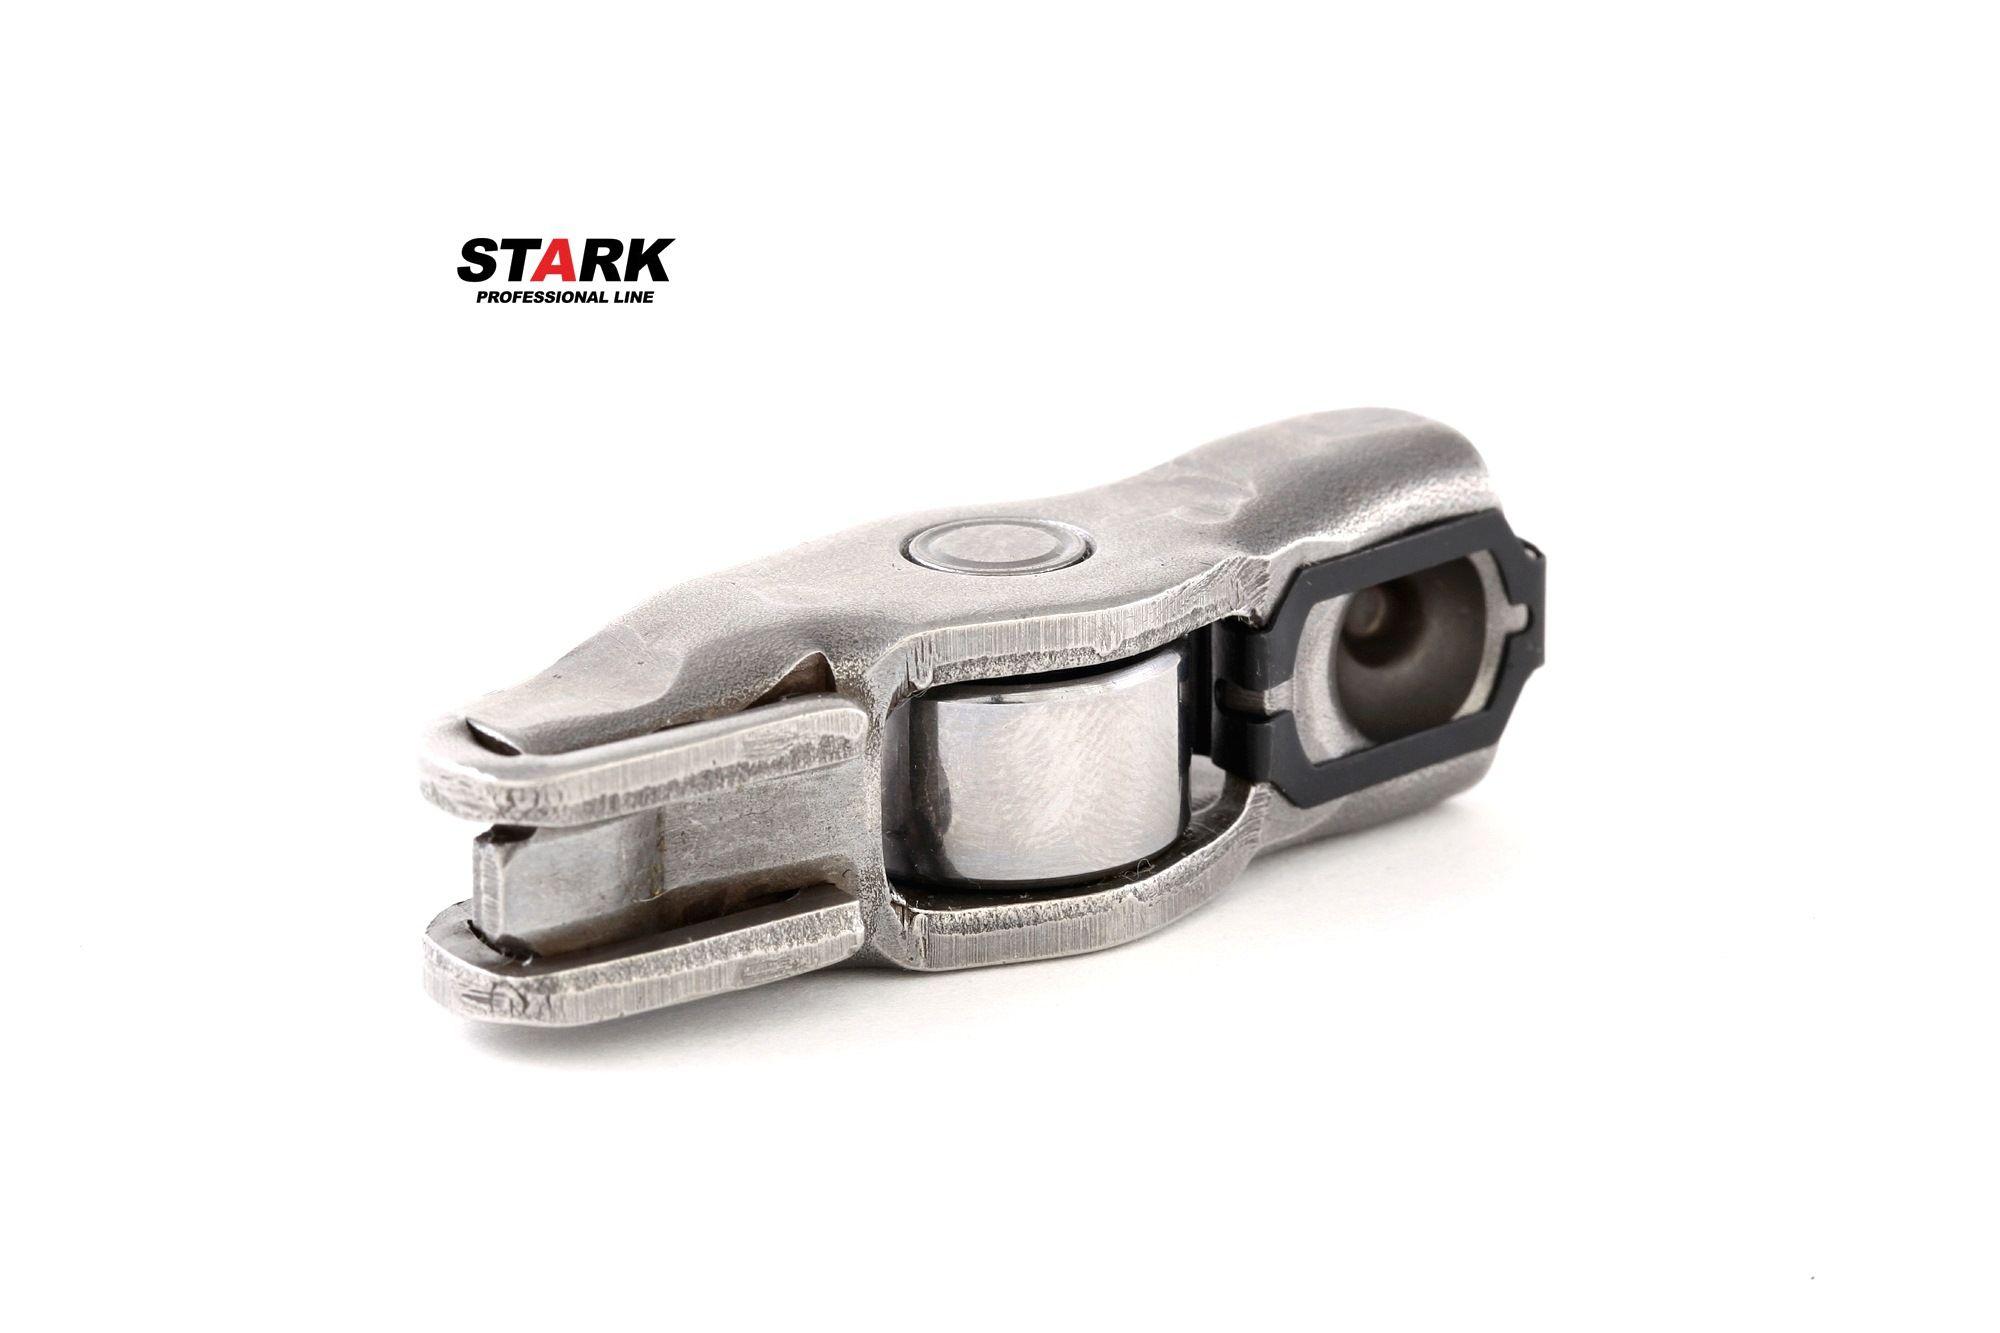 STARK: Original Schlepphebel SKRAV-1730004 ()